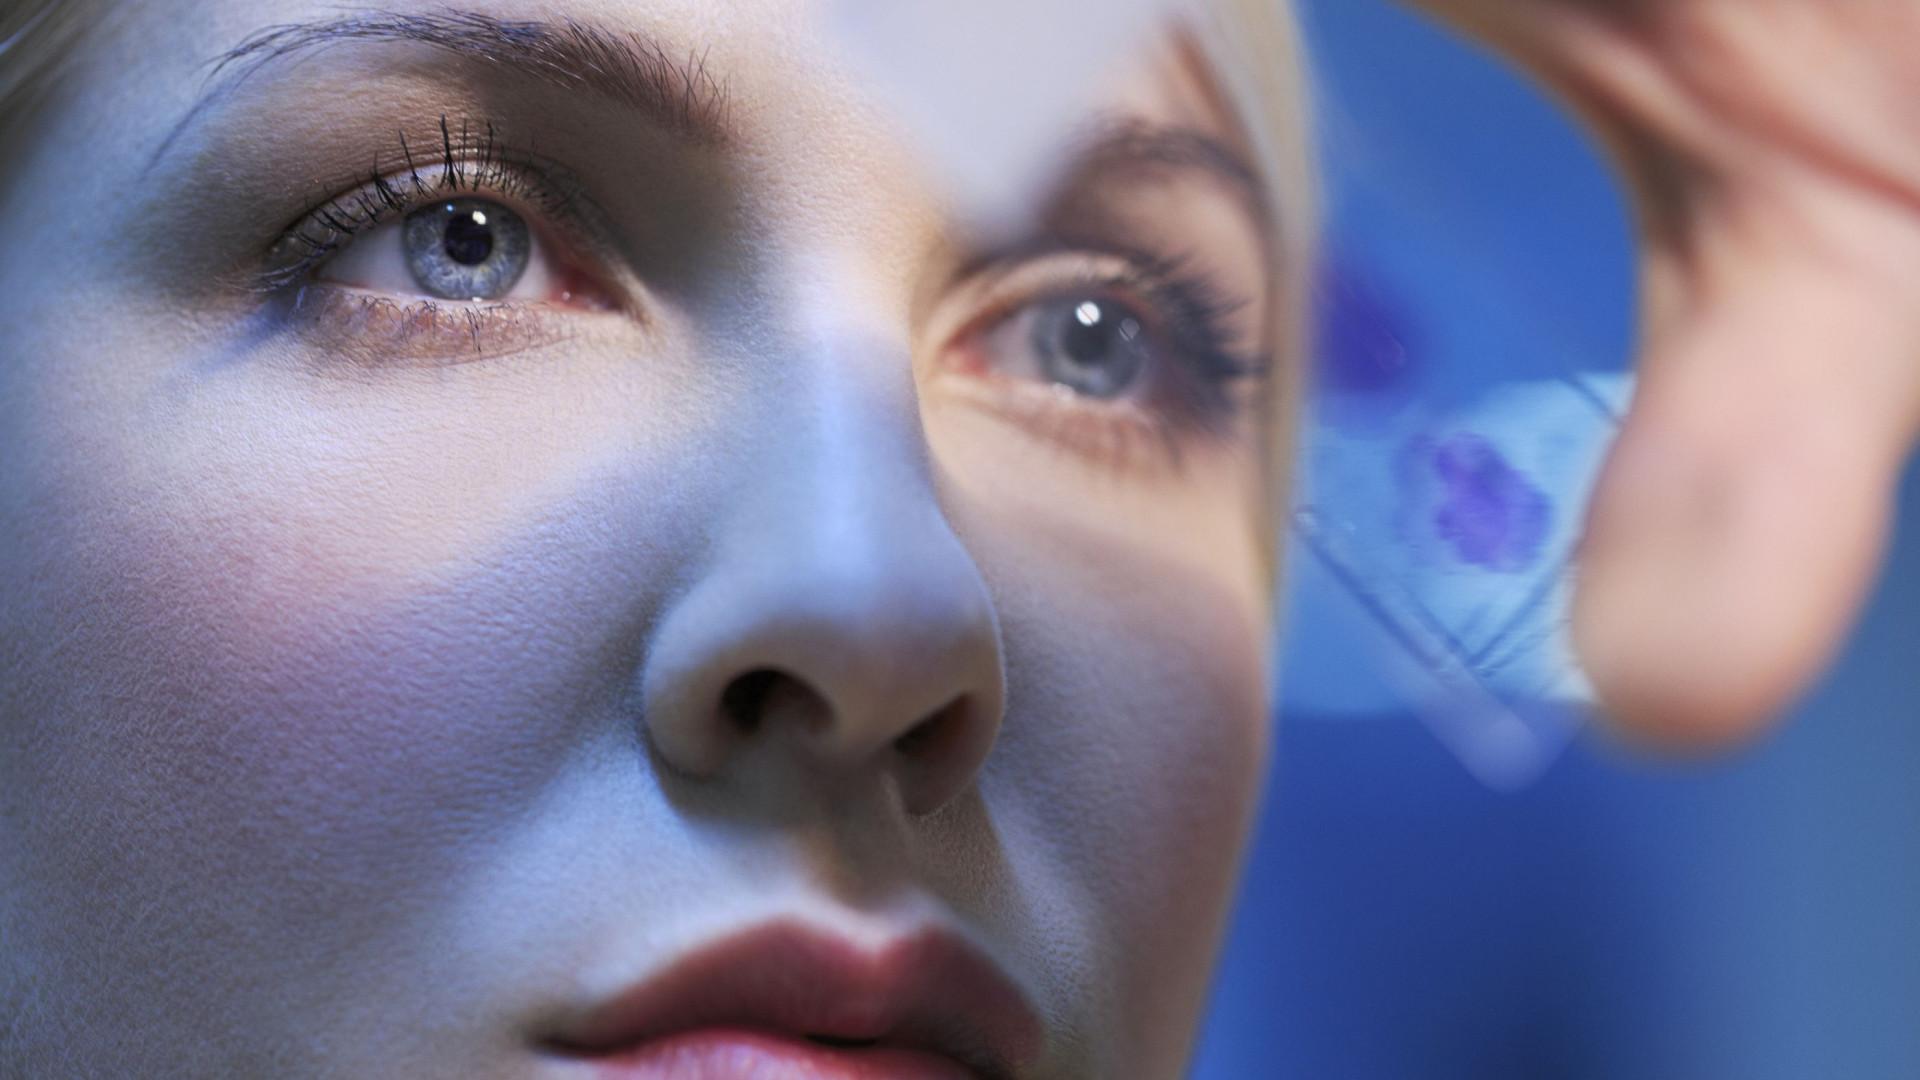 Cientistas desenvolvem vírus 'inteligente' que mata células cancerígenas